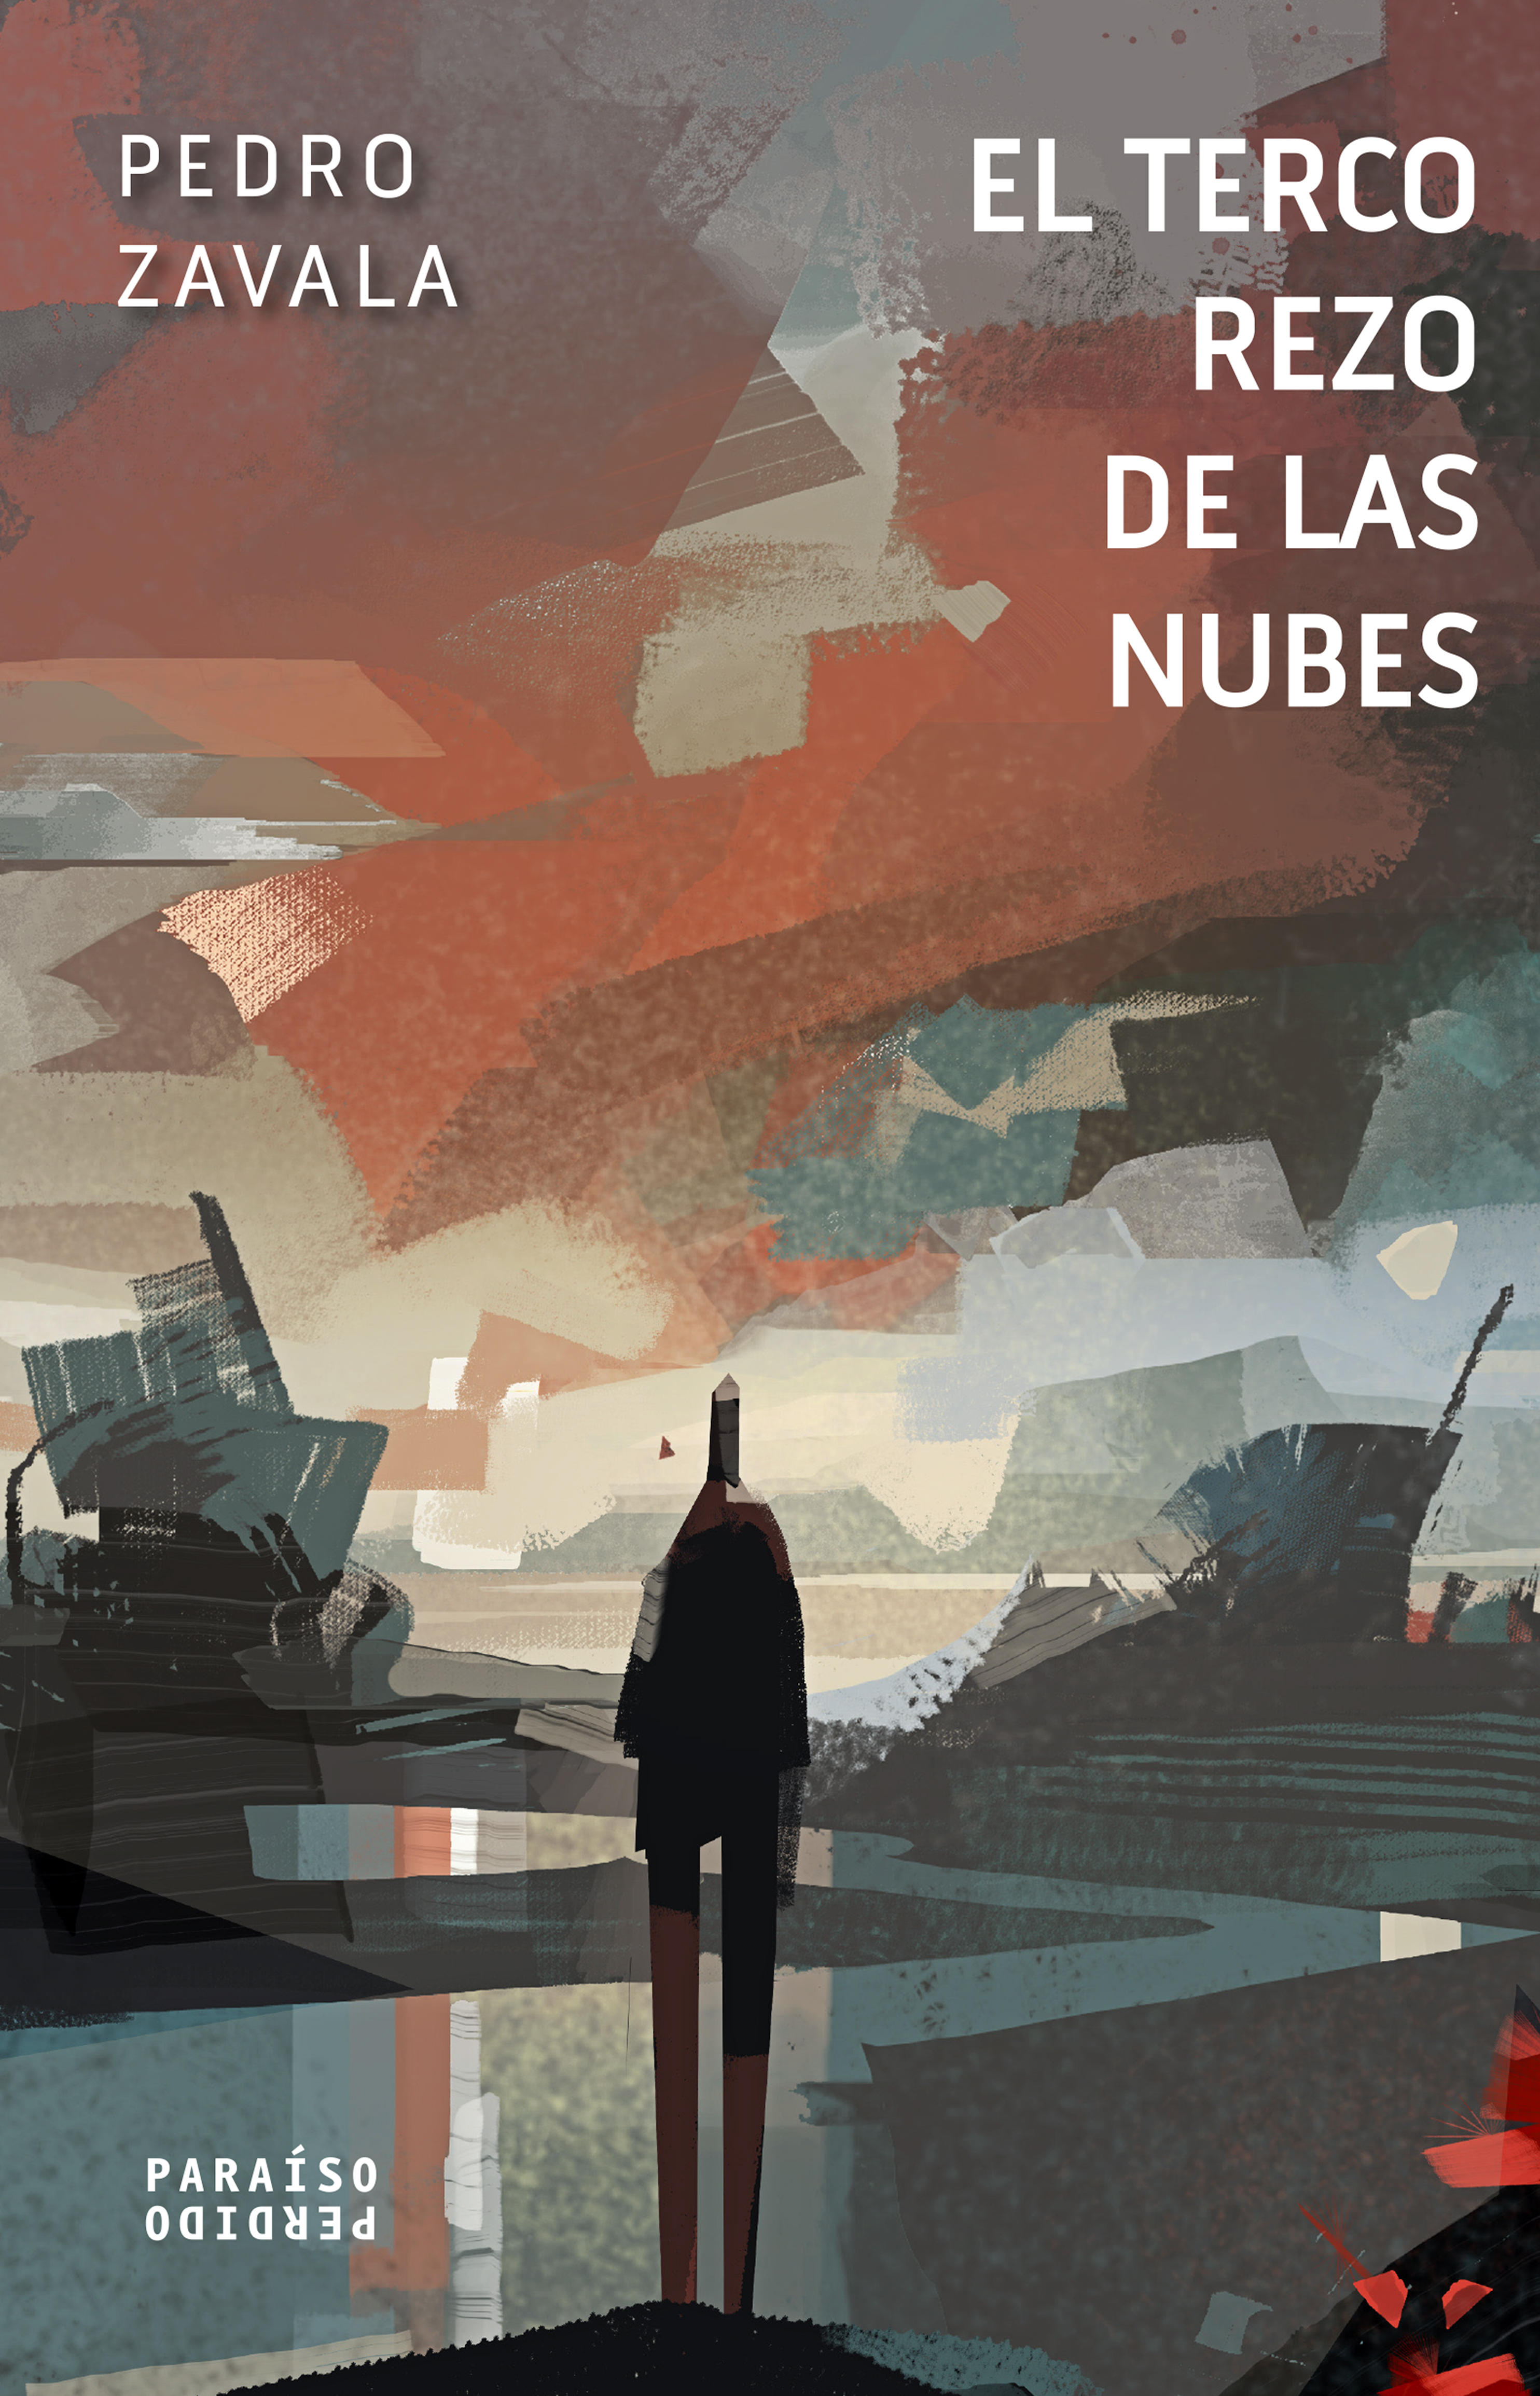 Pedro Zavala El terco rezo de las nubes fernão lopes chronica de el rei d pedro i portuguese edition